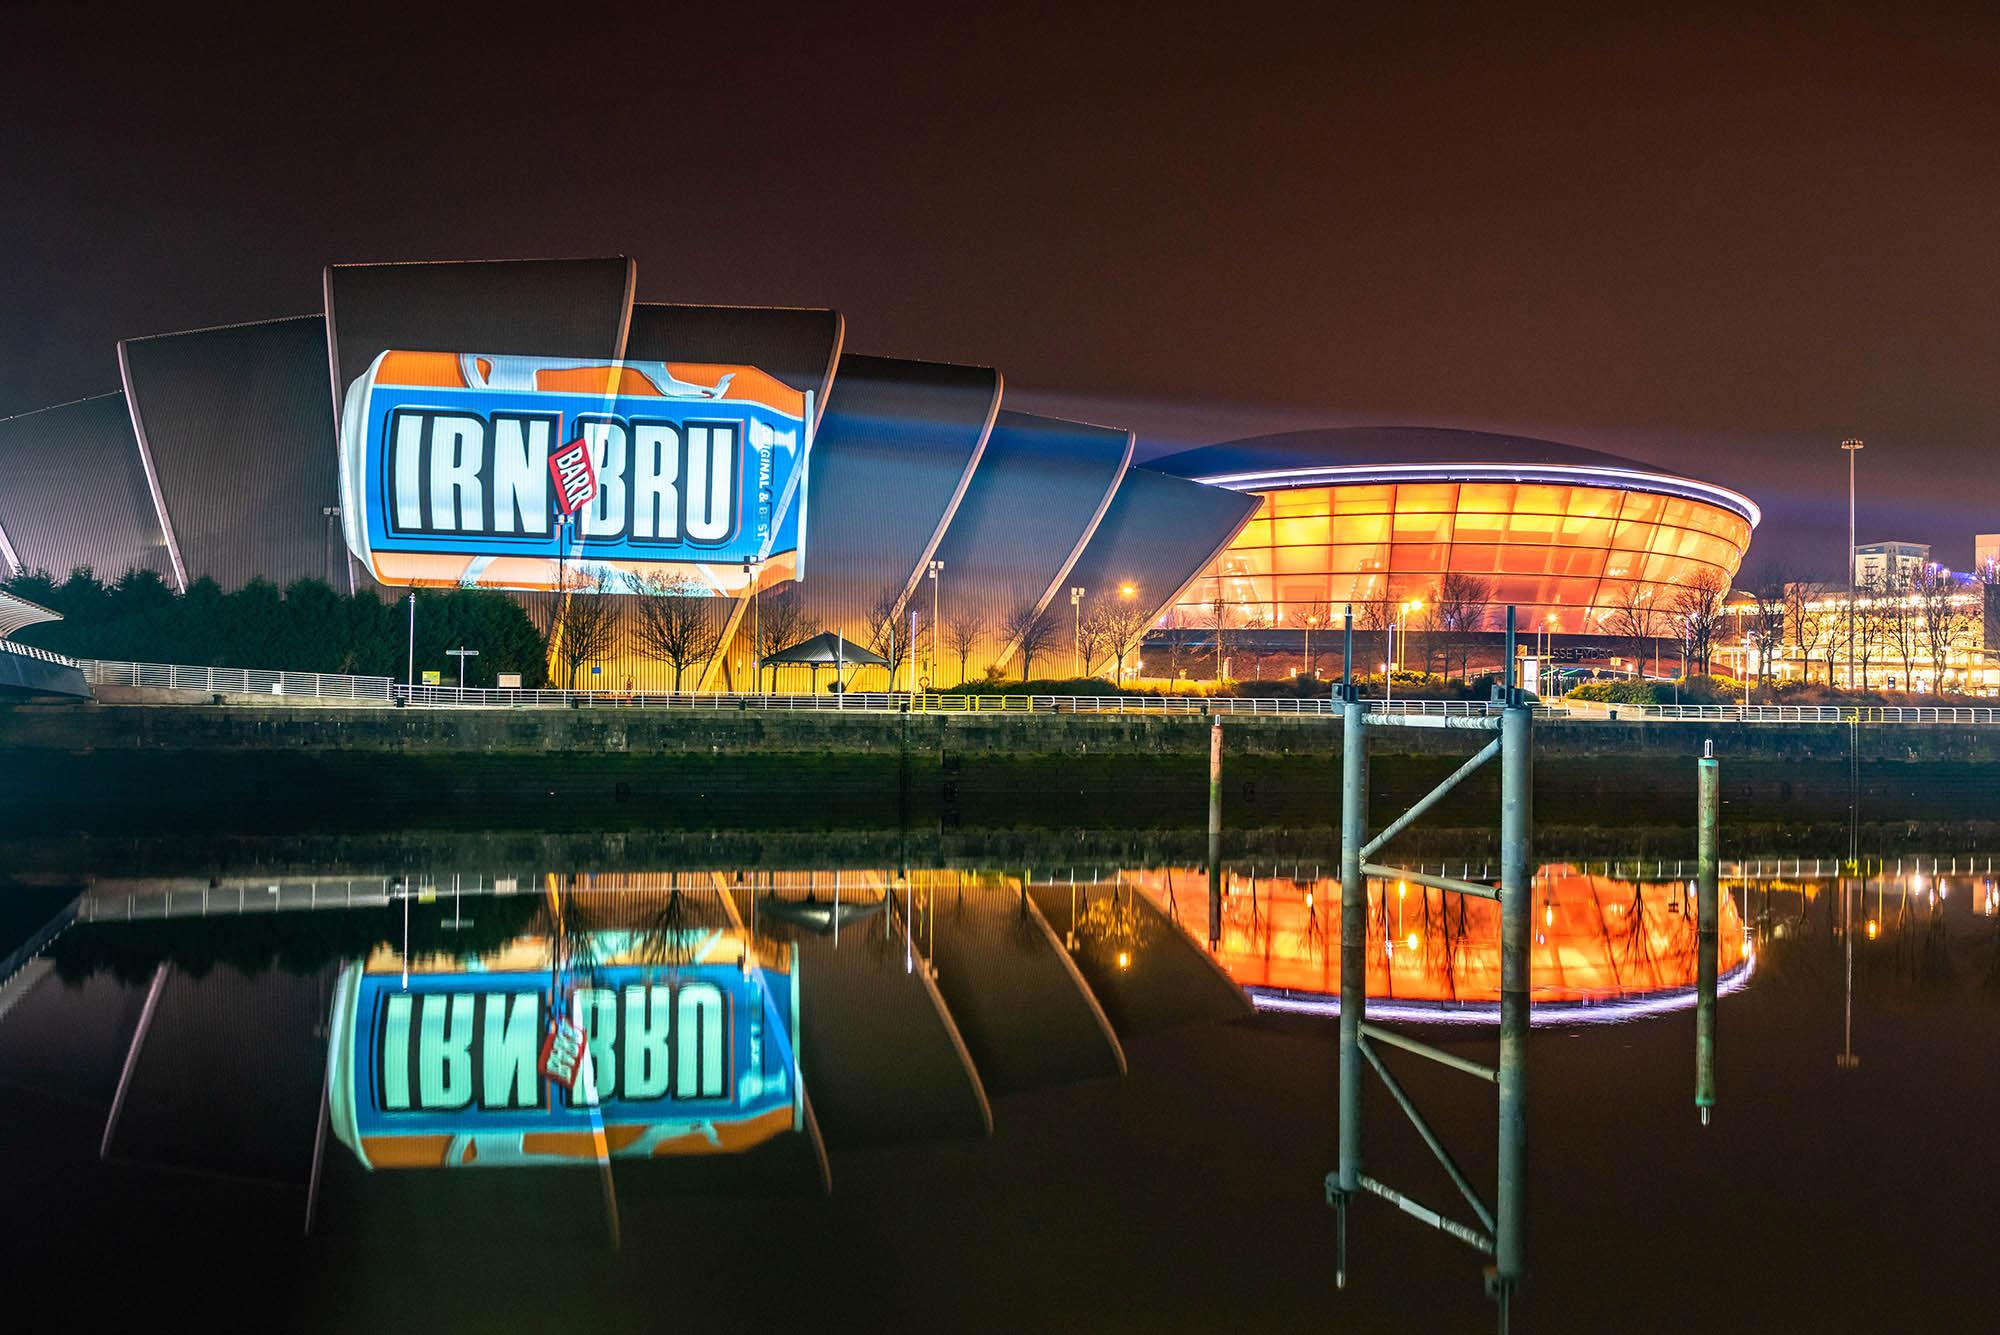 Irn Bru Projection Marketing, on Glasgow Armadillo